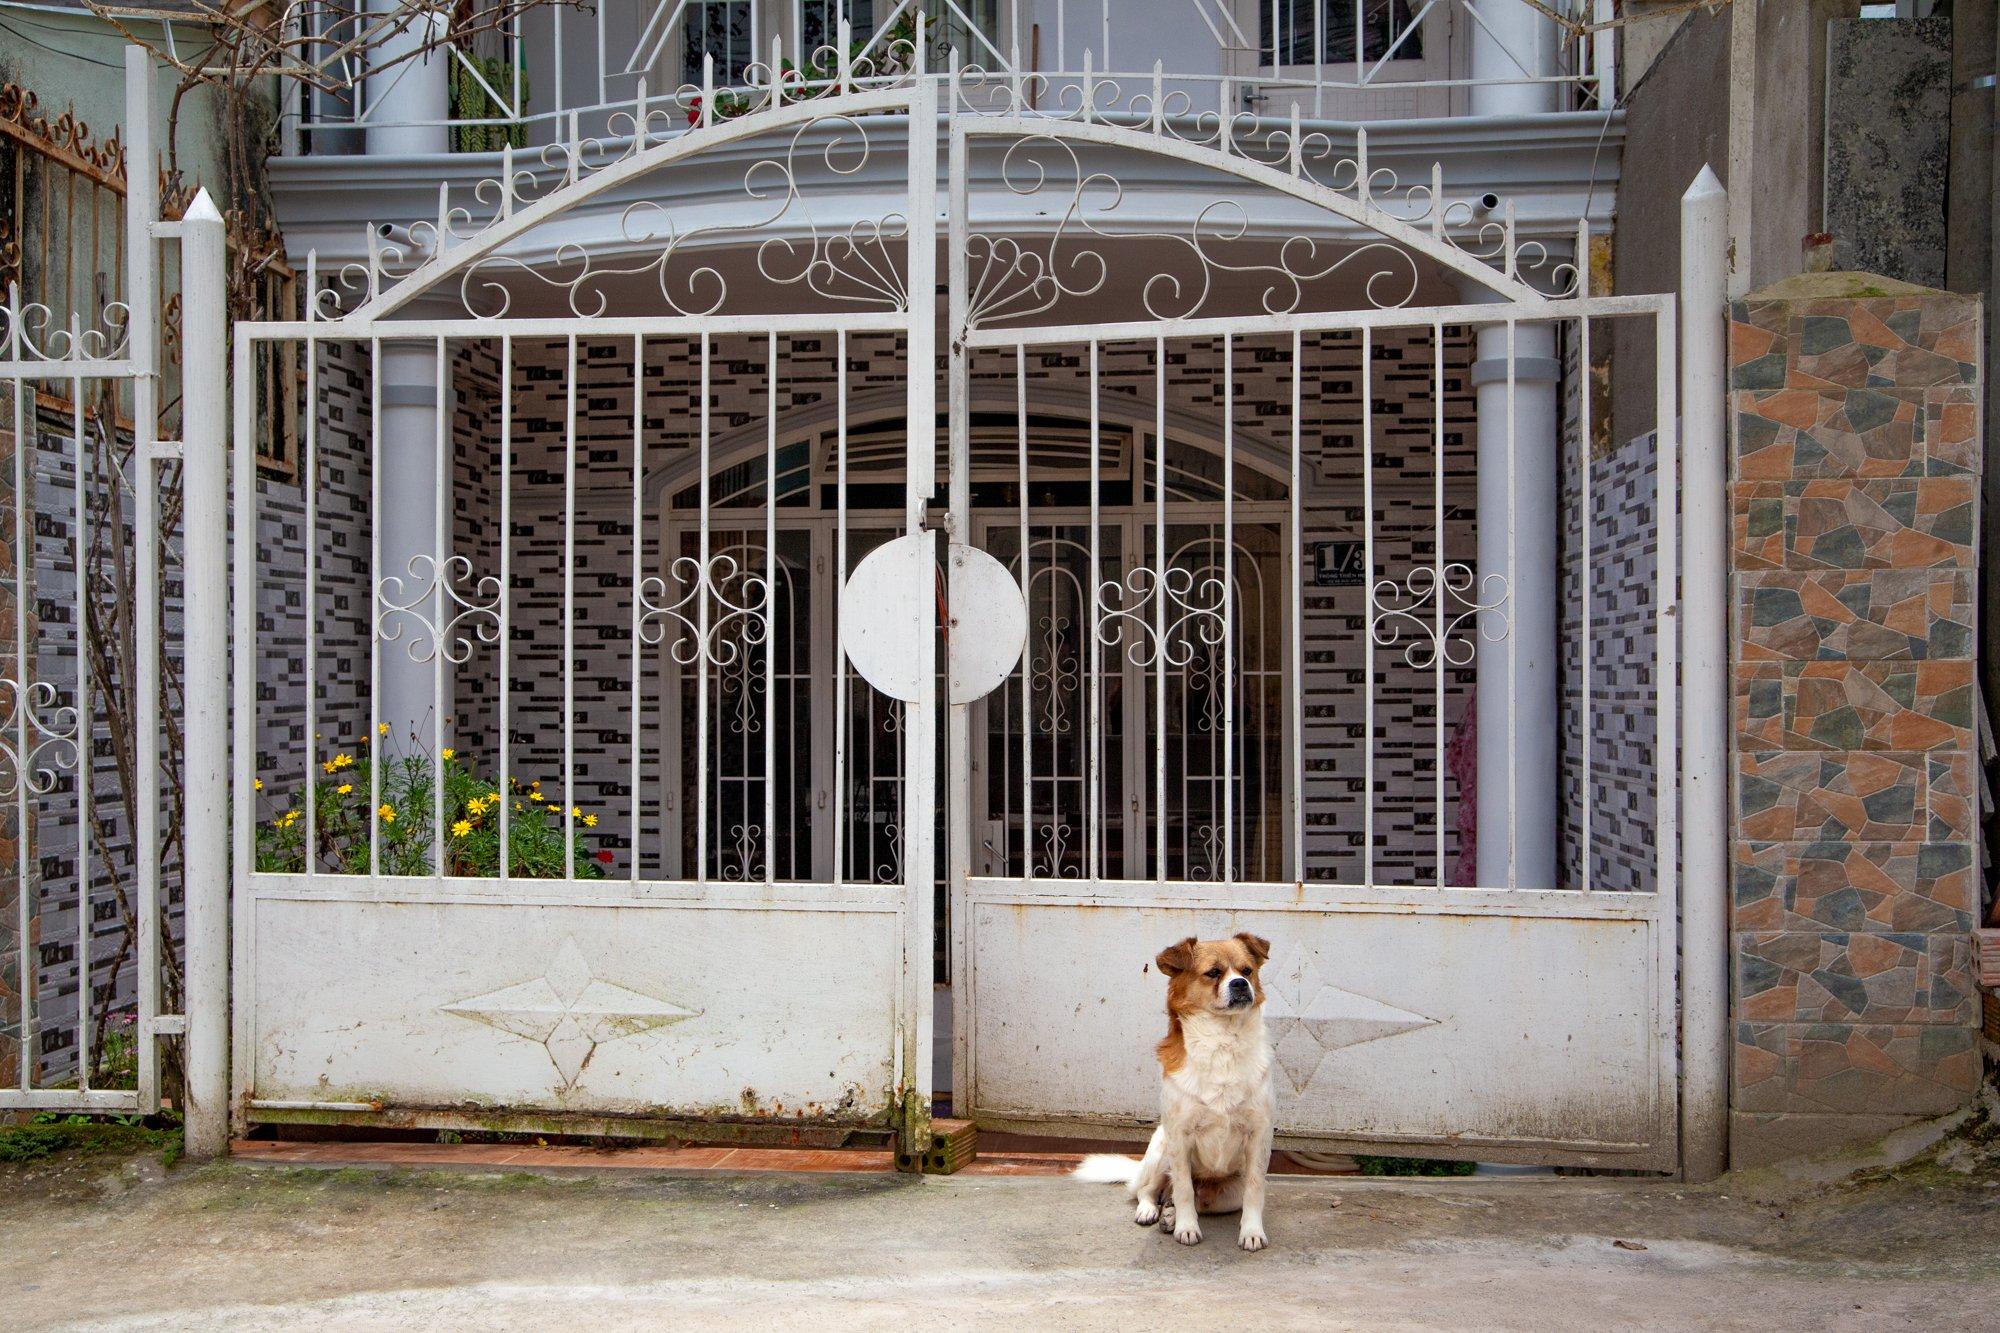 Neighborhood Dog in Dalat Vietnam